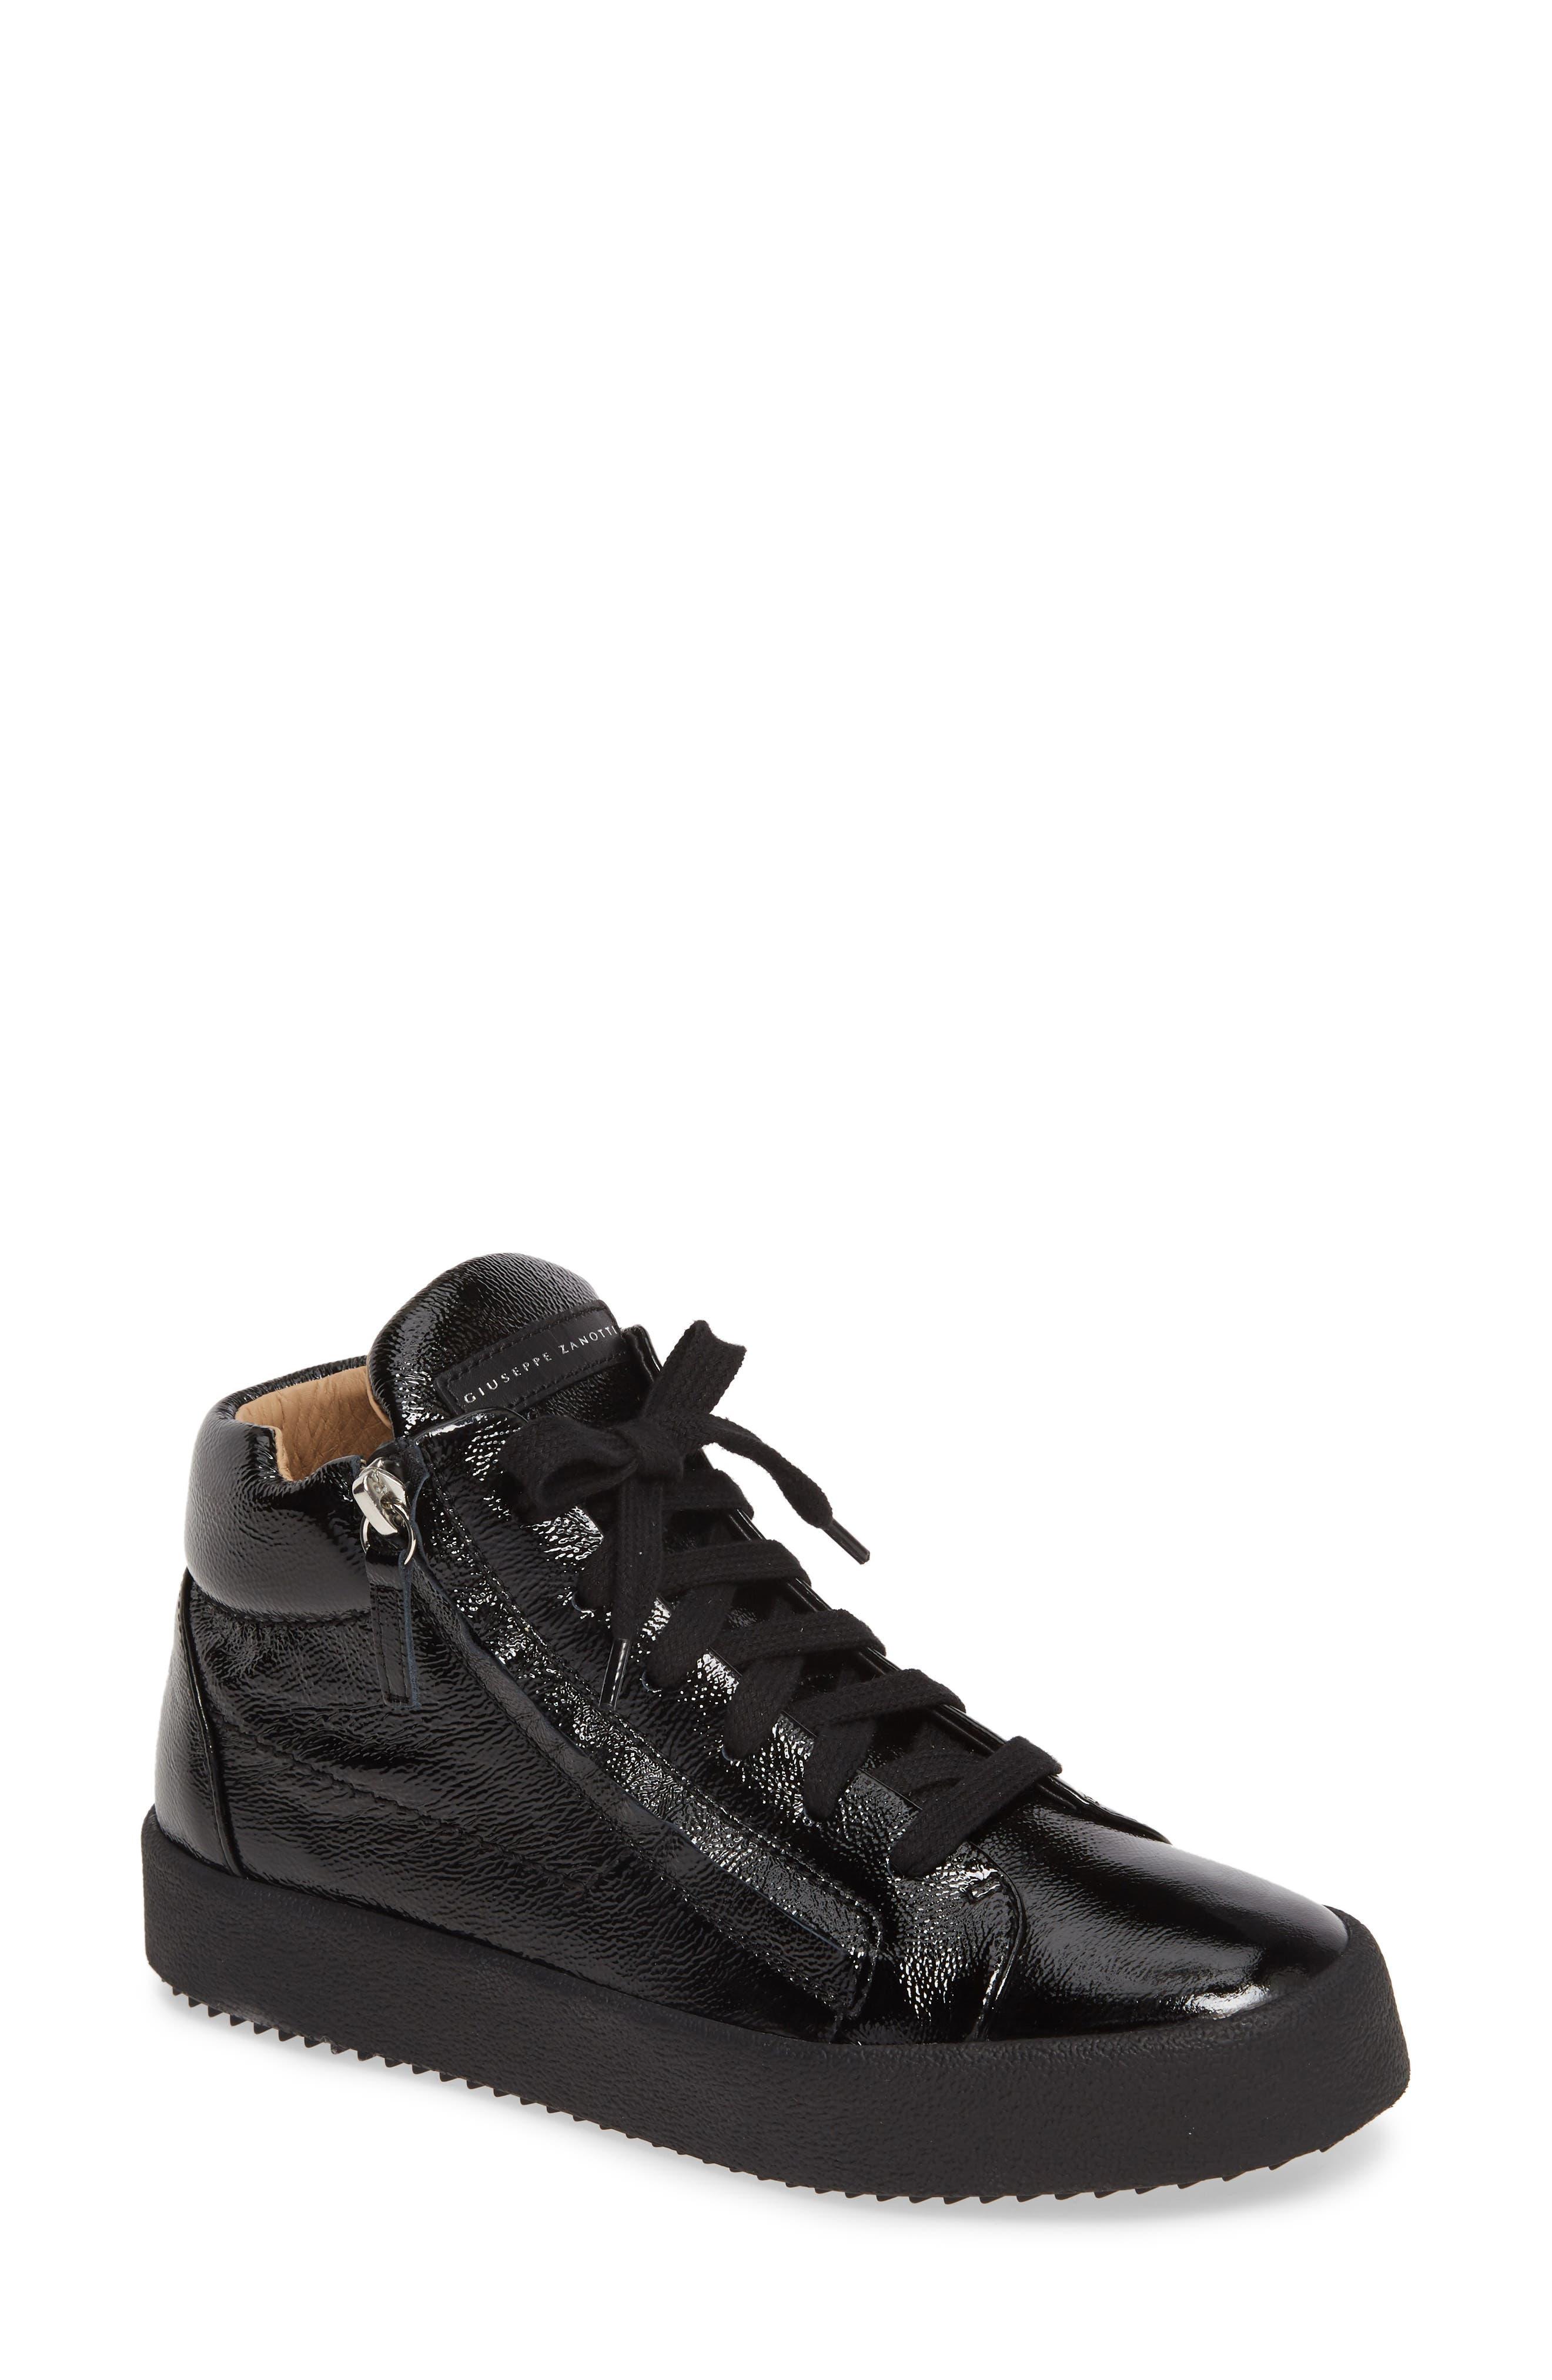 Giuseppe Zanotti May London Mid Top Sneaker, Black